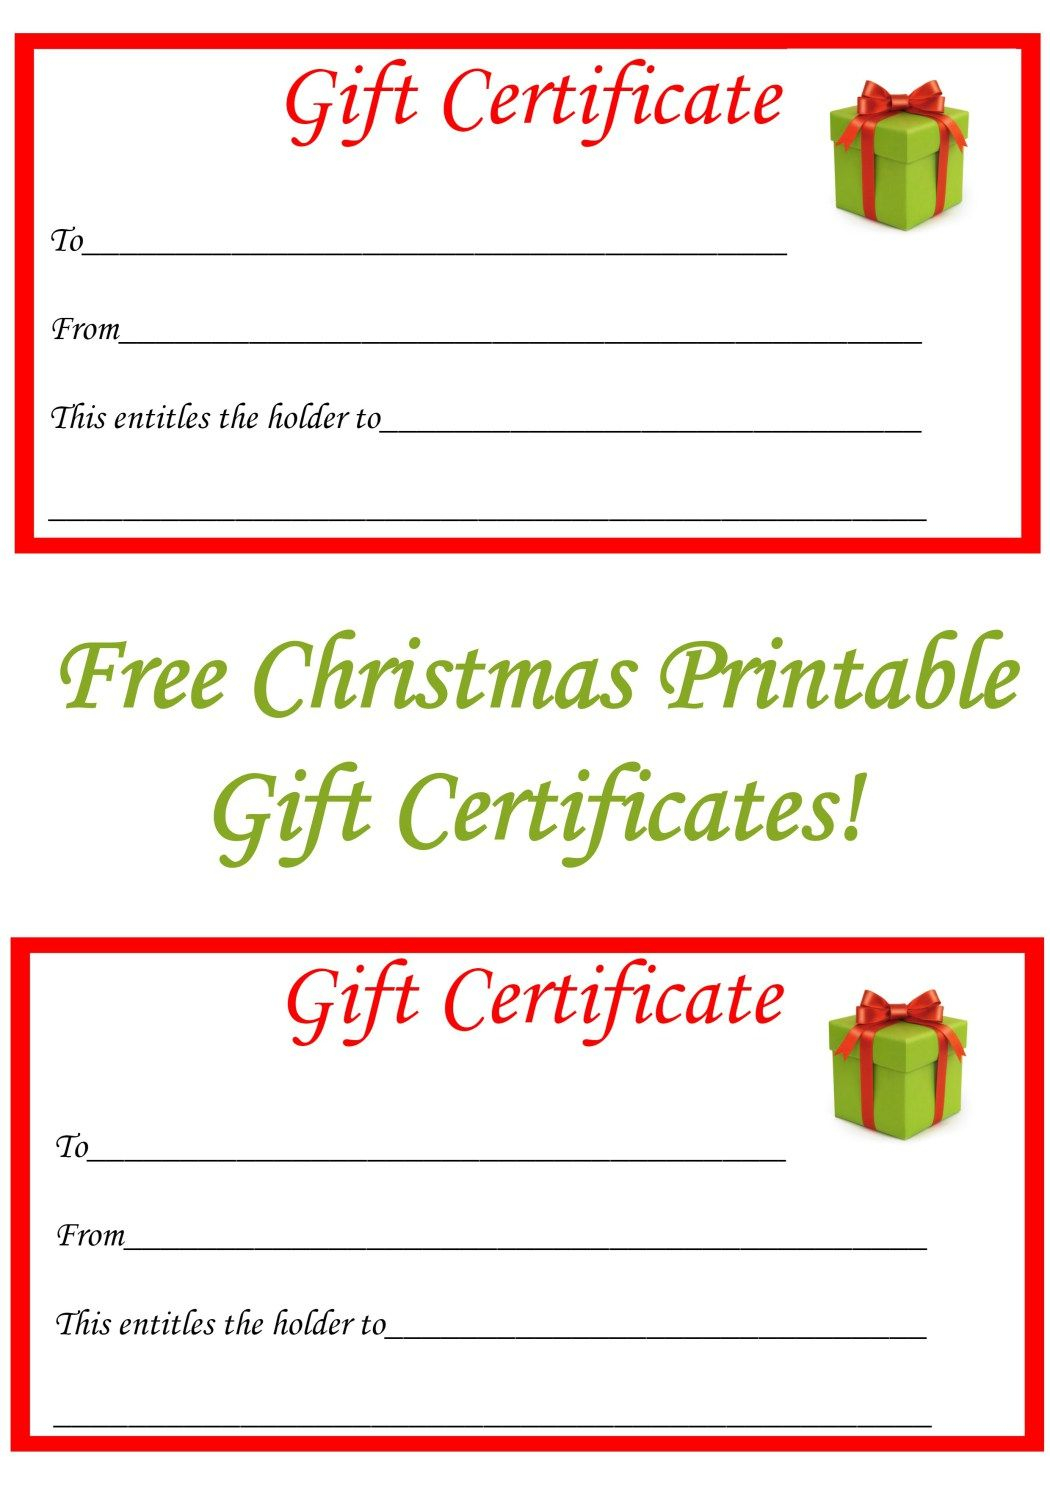 Free Christmas Printable Gift Certificates   Gift Ideas With Regard To Printable Gift Certificates Templates Free